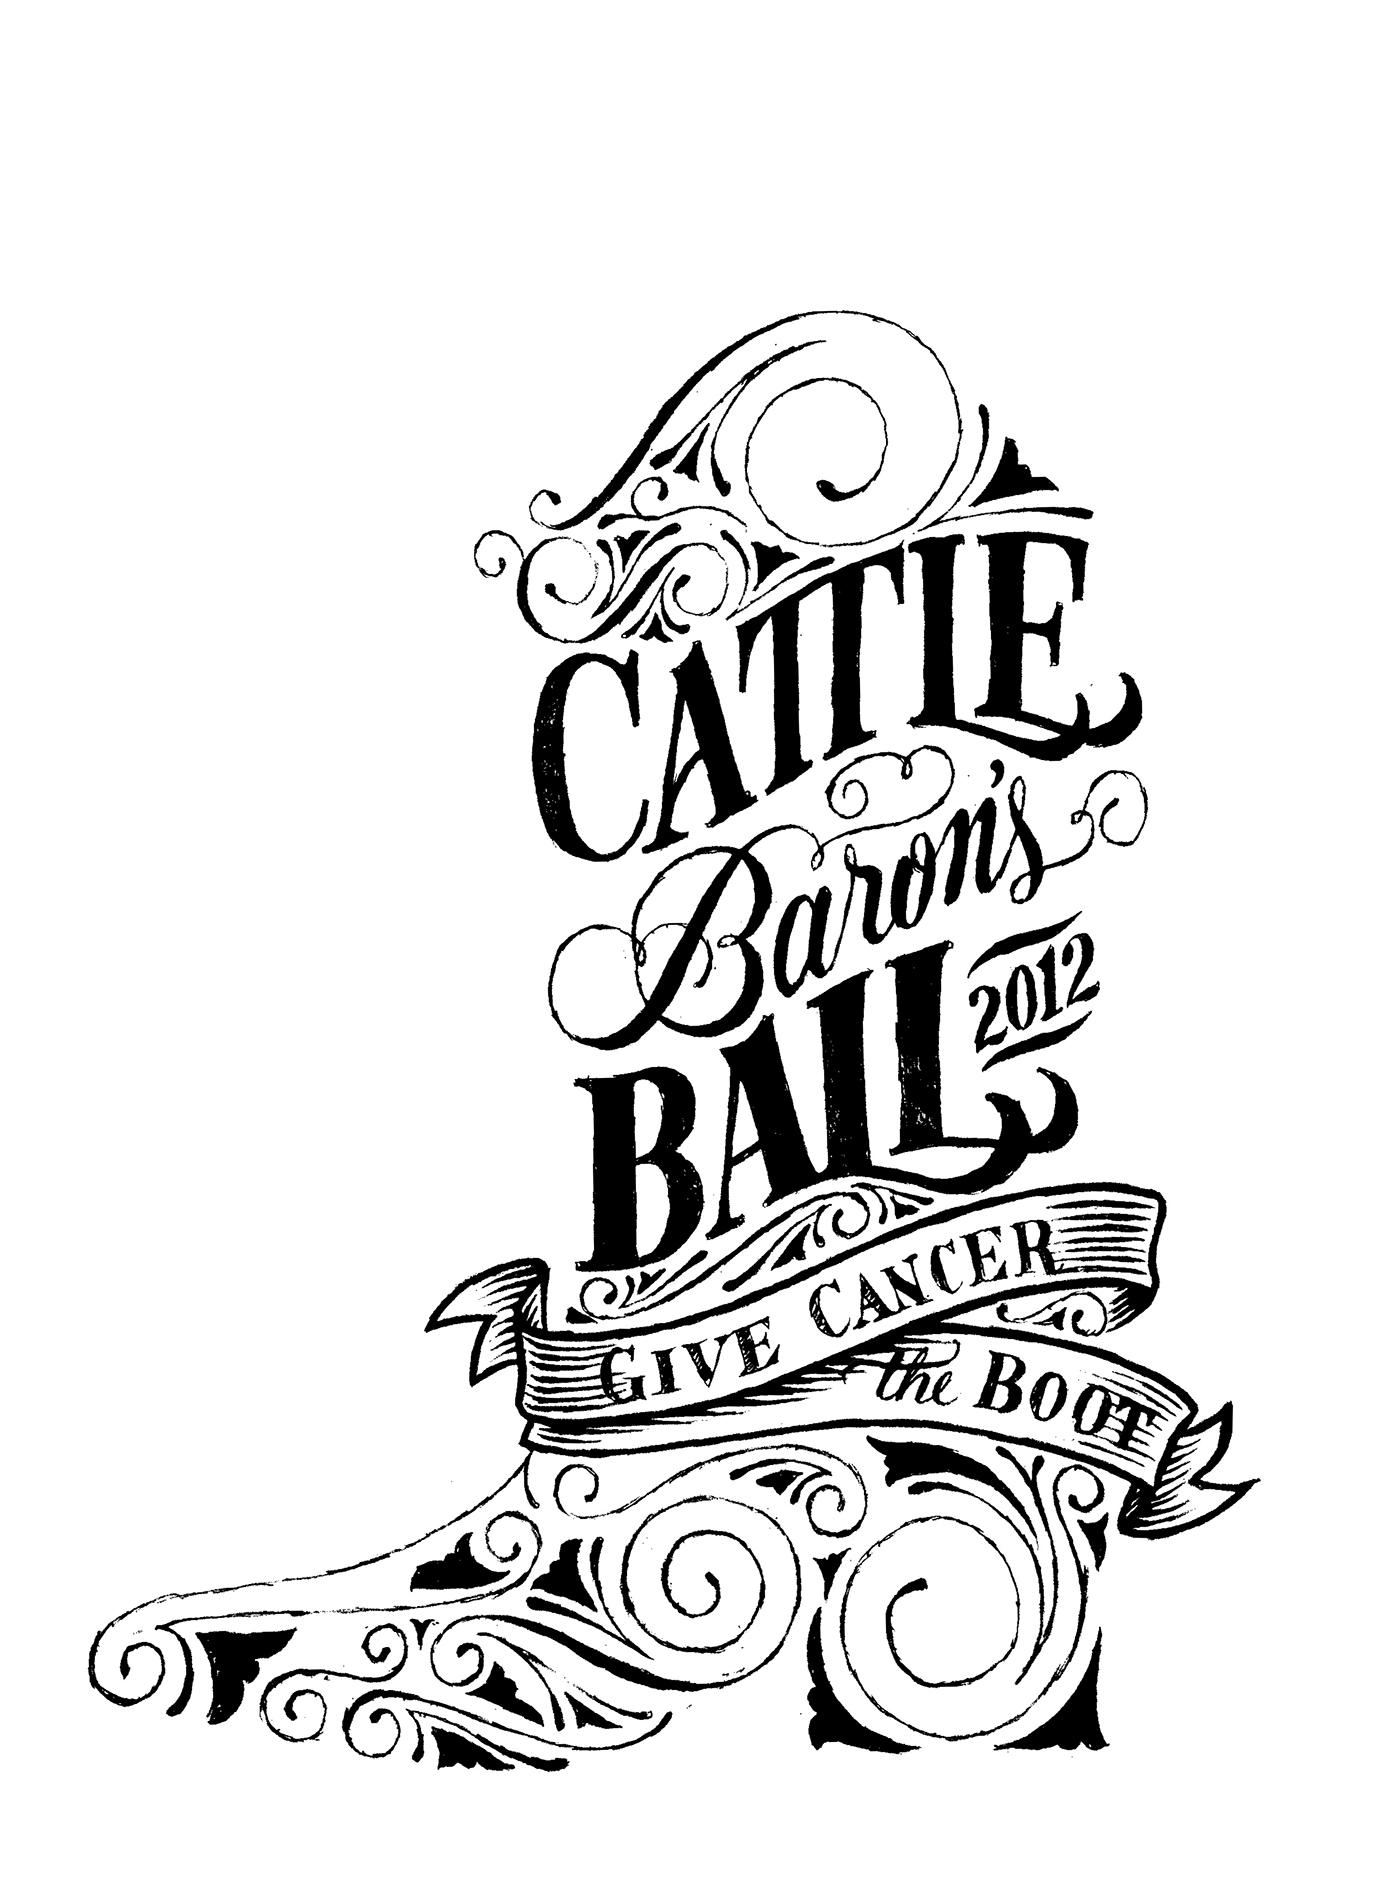 Cattle Baron S Ball Theme Logo On Behance